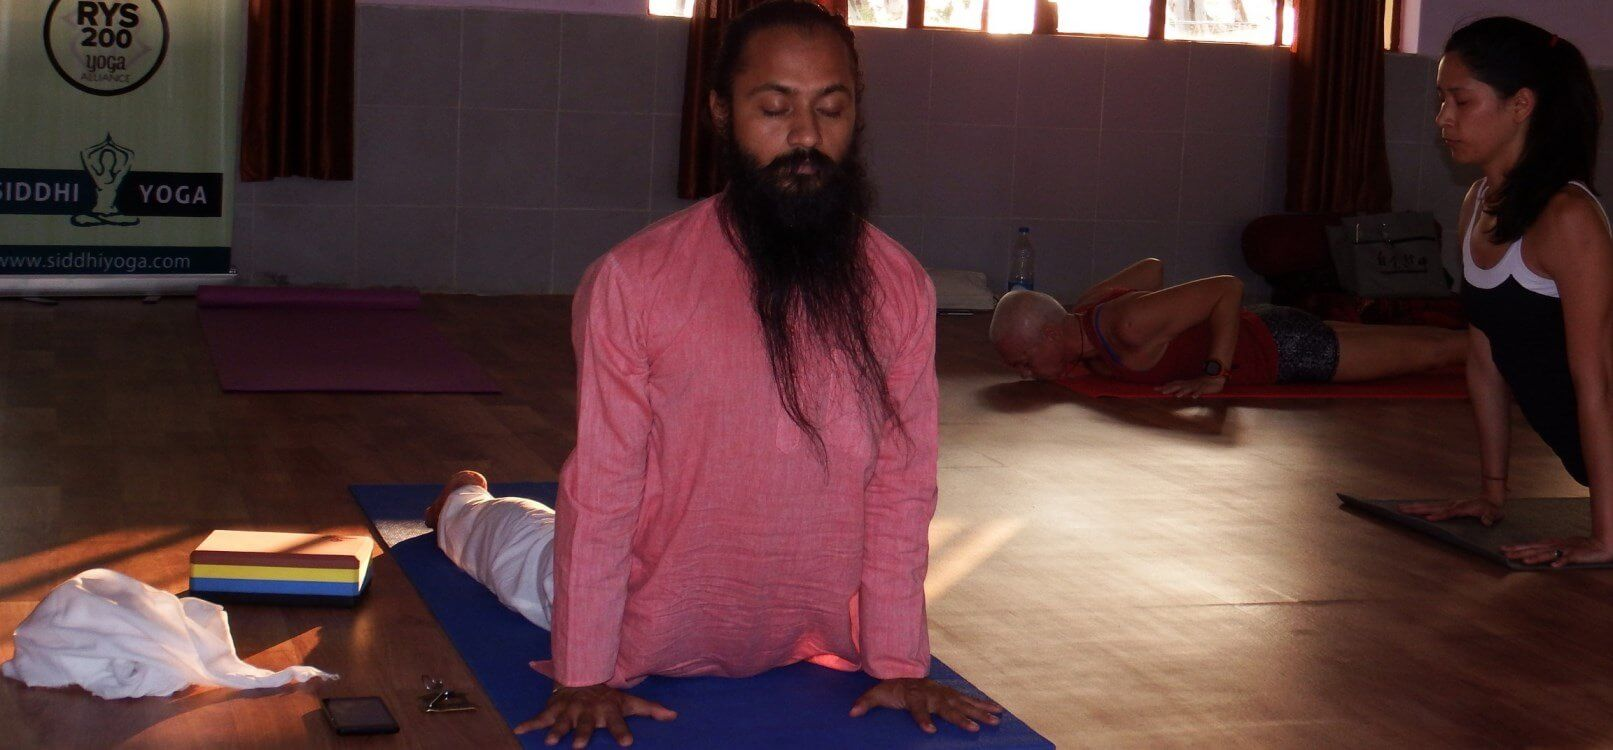 indian hataha yoga teacher guru mukh